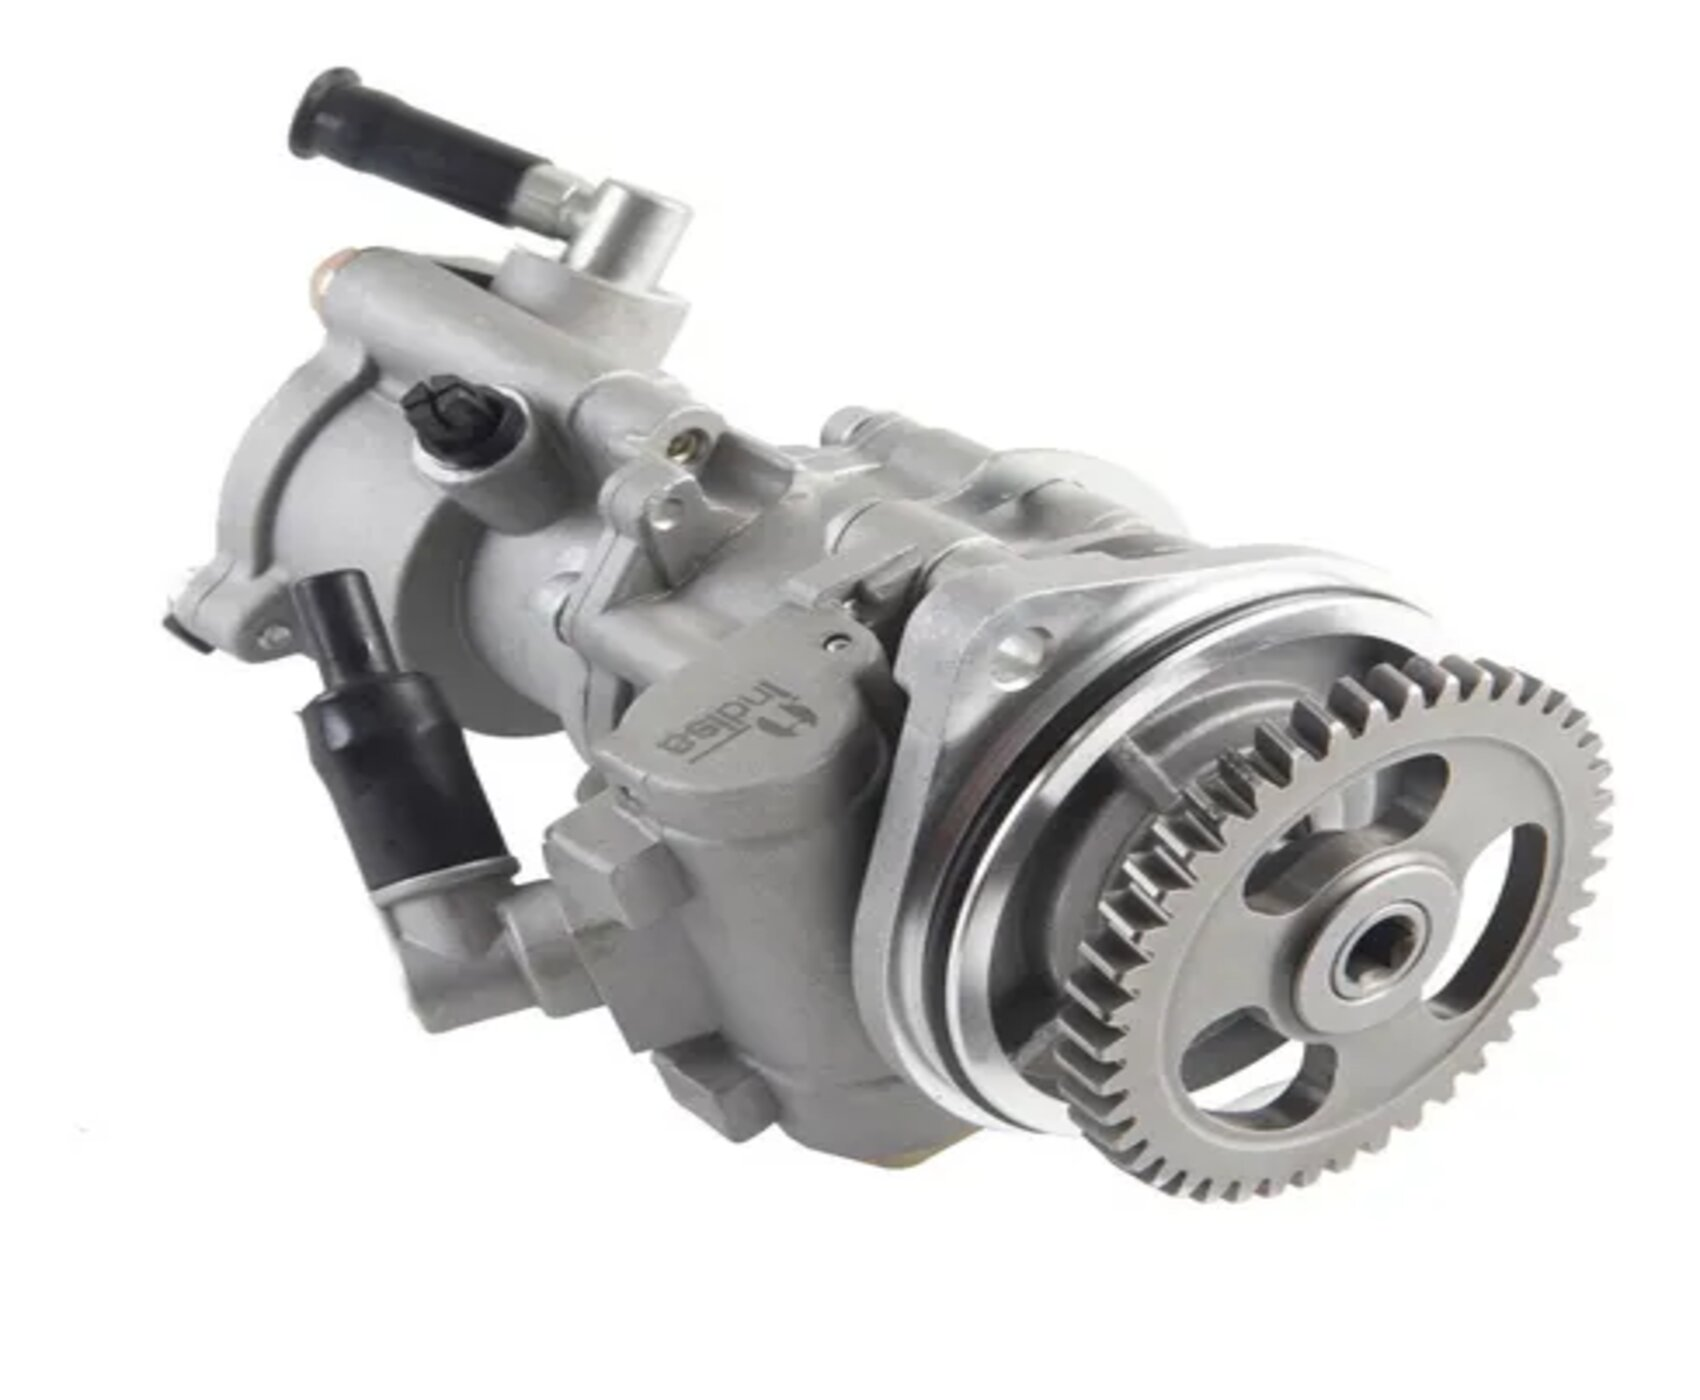 Bomba Direção Hidráulica Blazer S10 2.8 Troller T6 Sprint 4.0 98 A 02